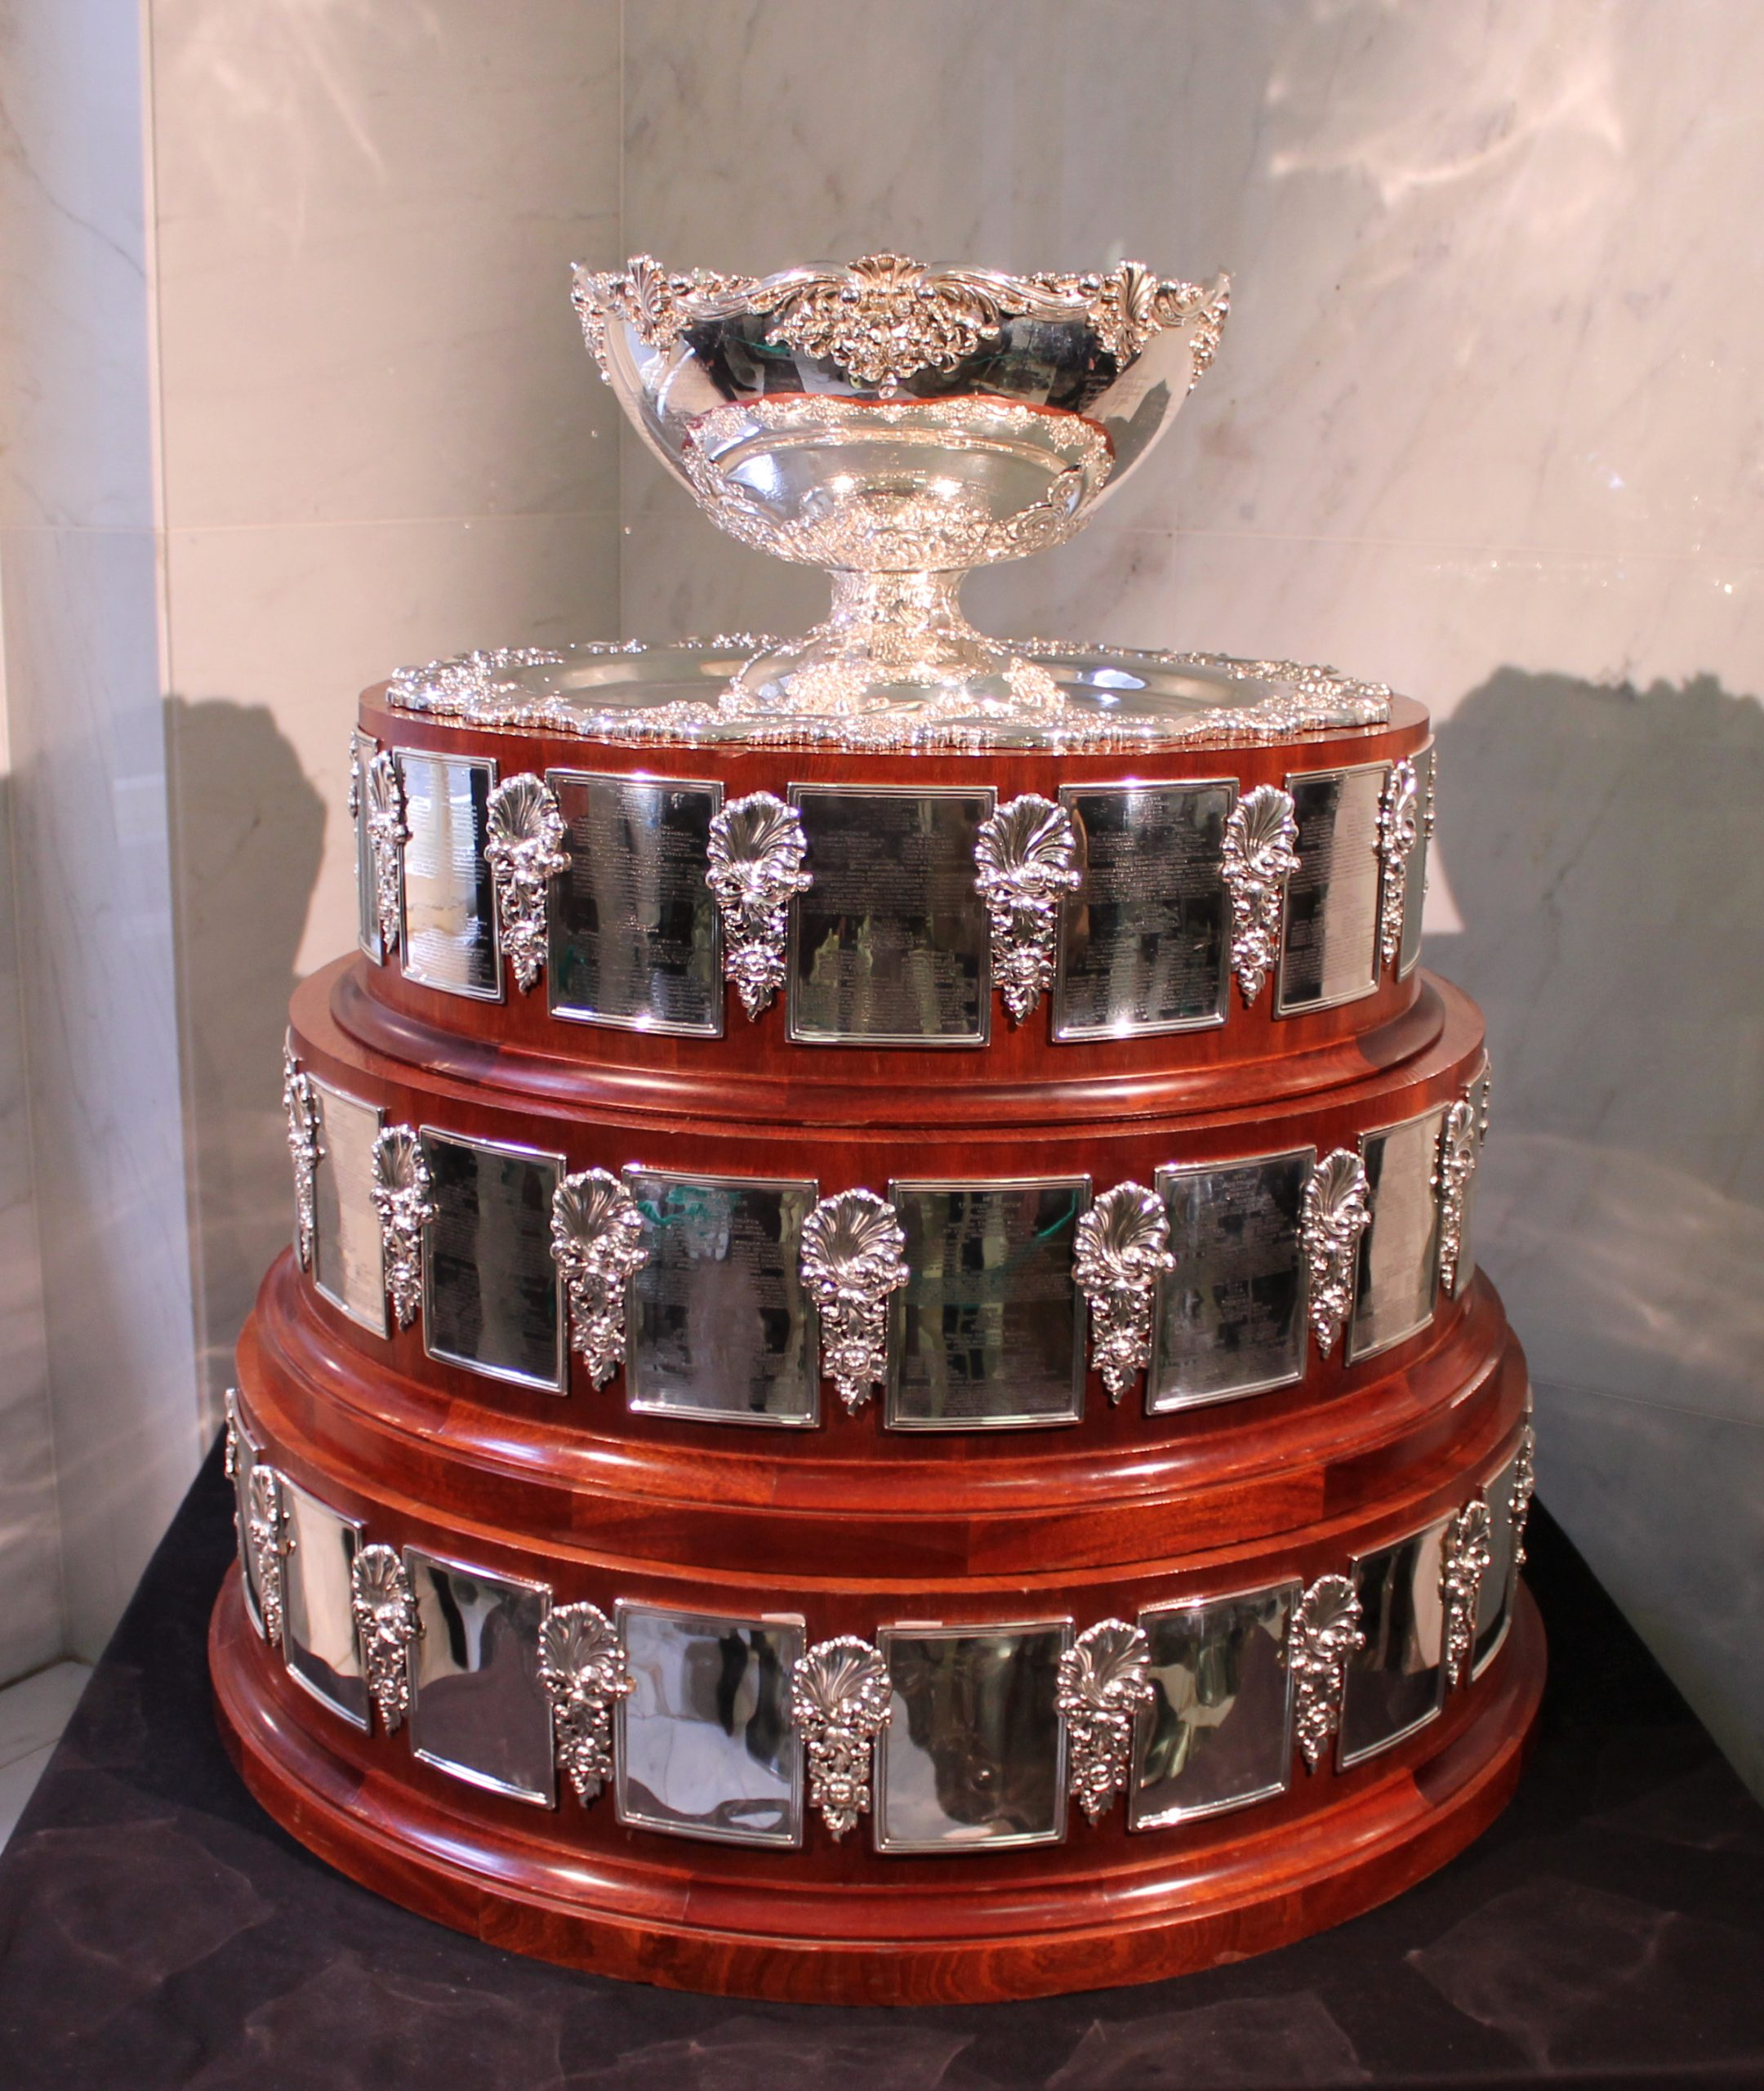 Davis Cup Betting Odds